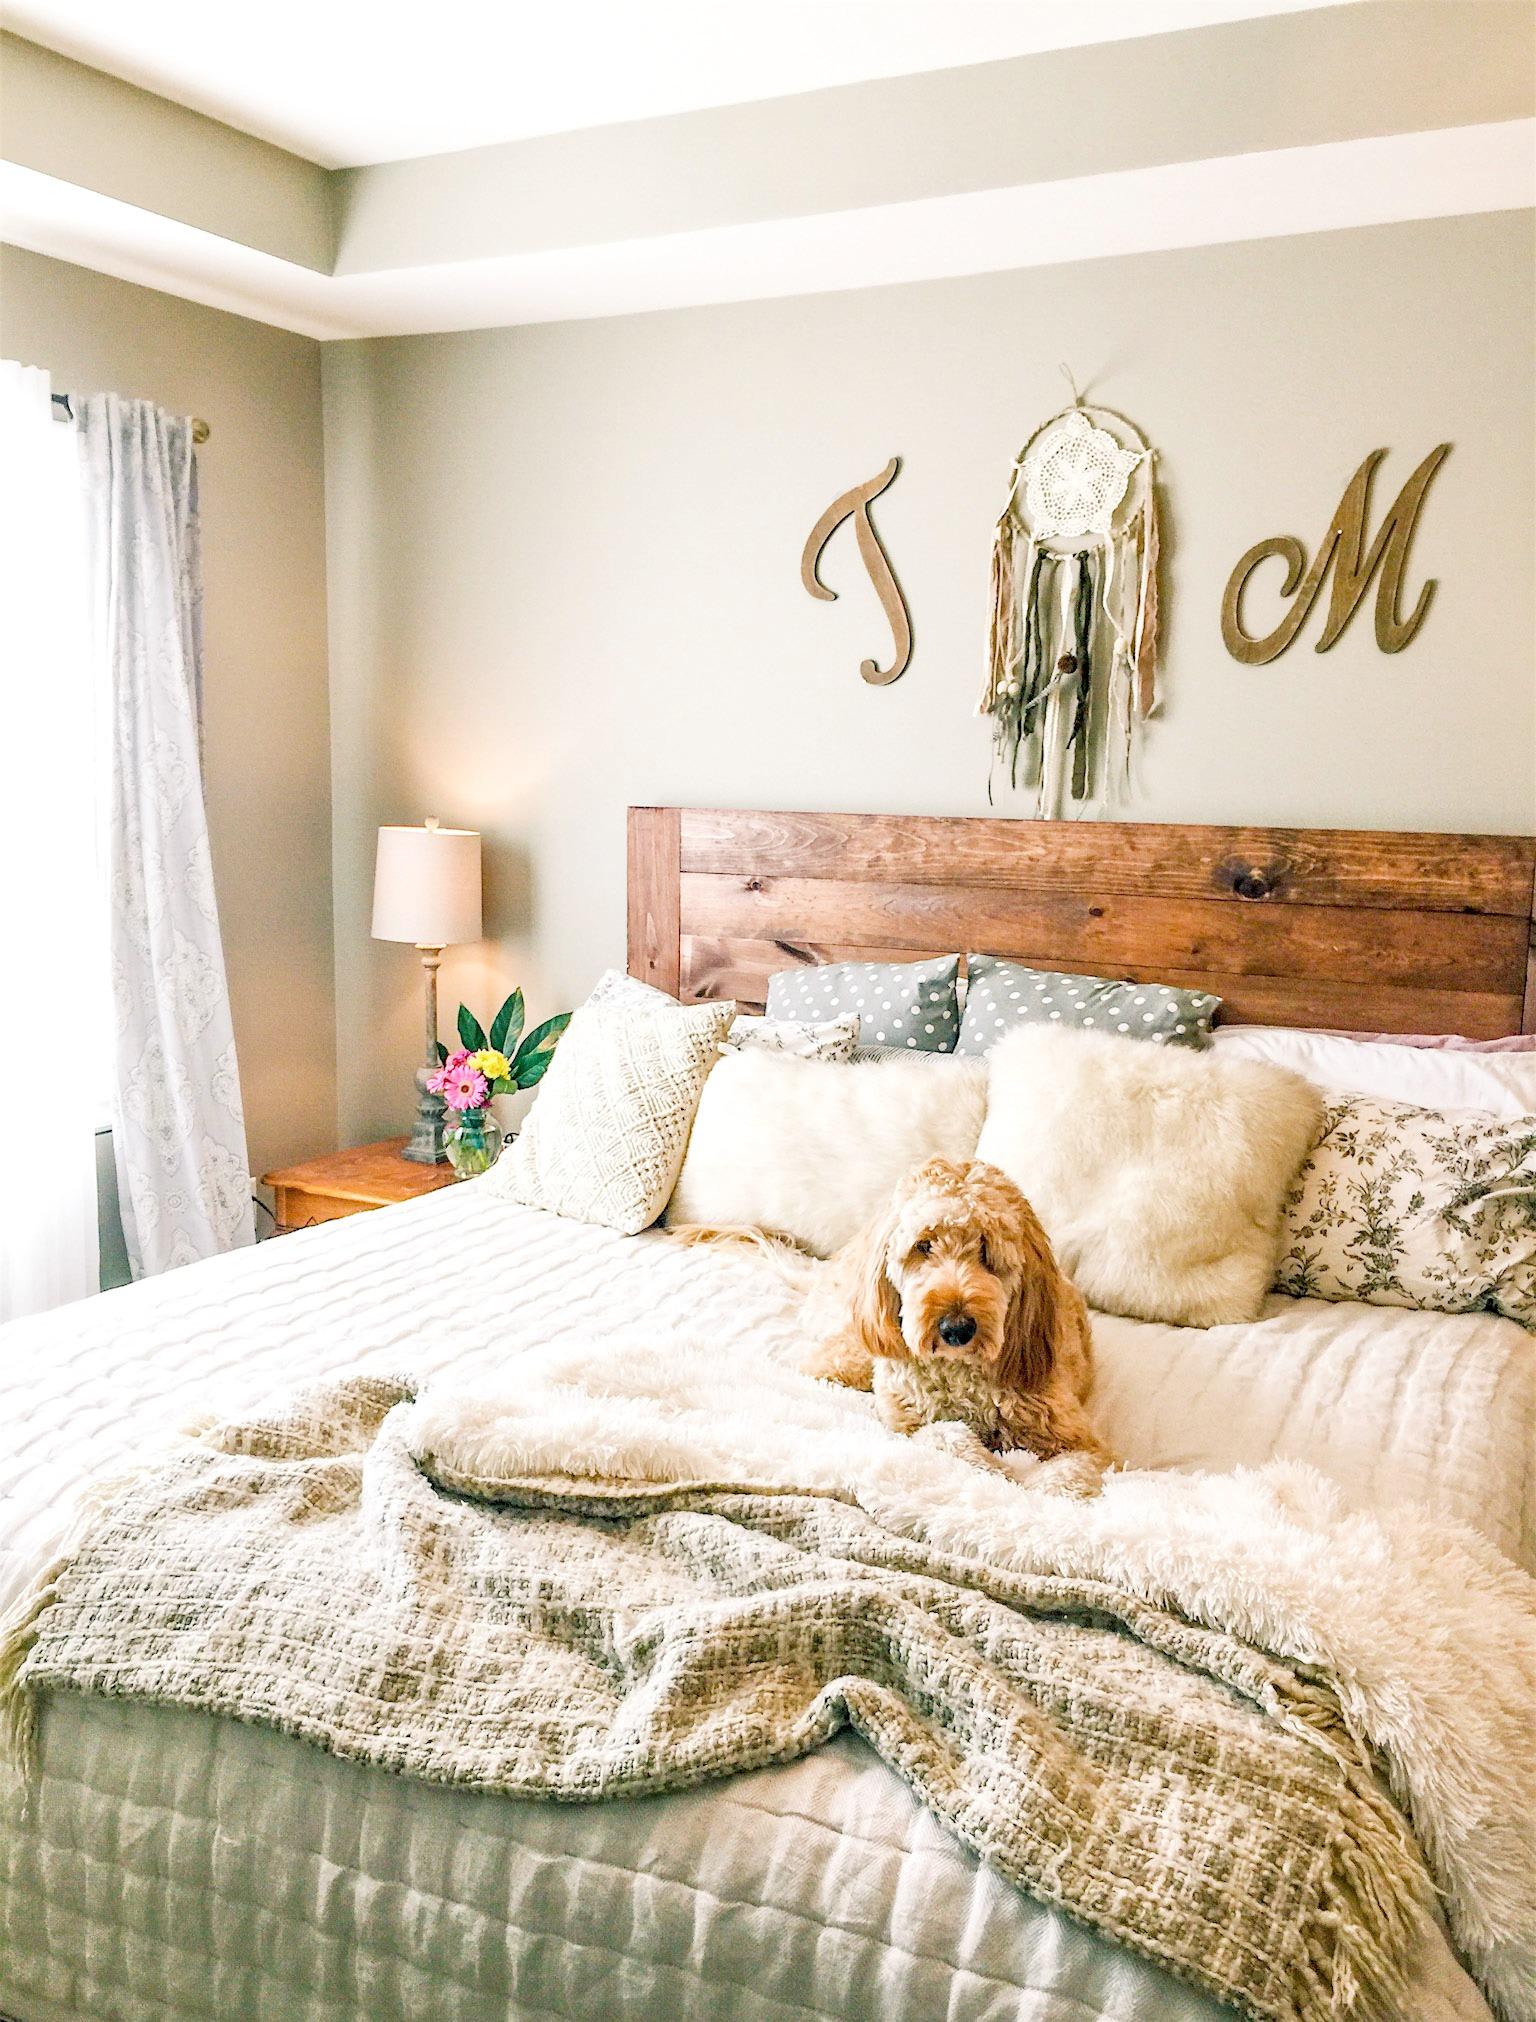 Healthy Eats Dog Training & Room Decor – Simply Taralynn